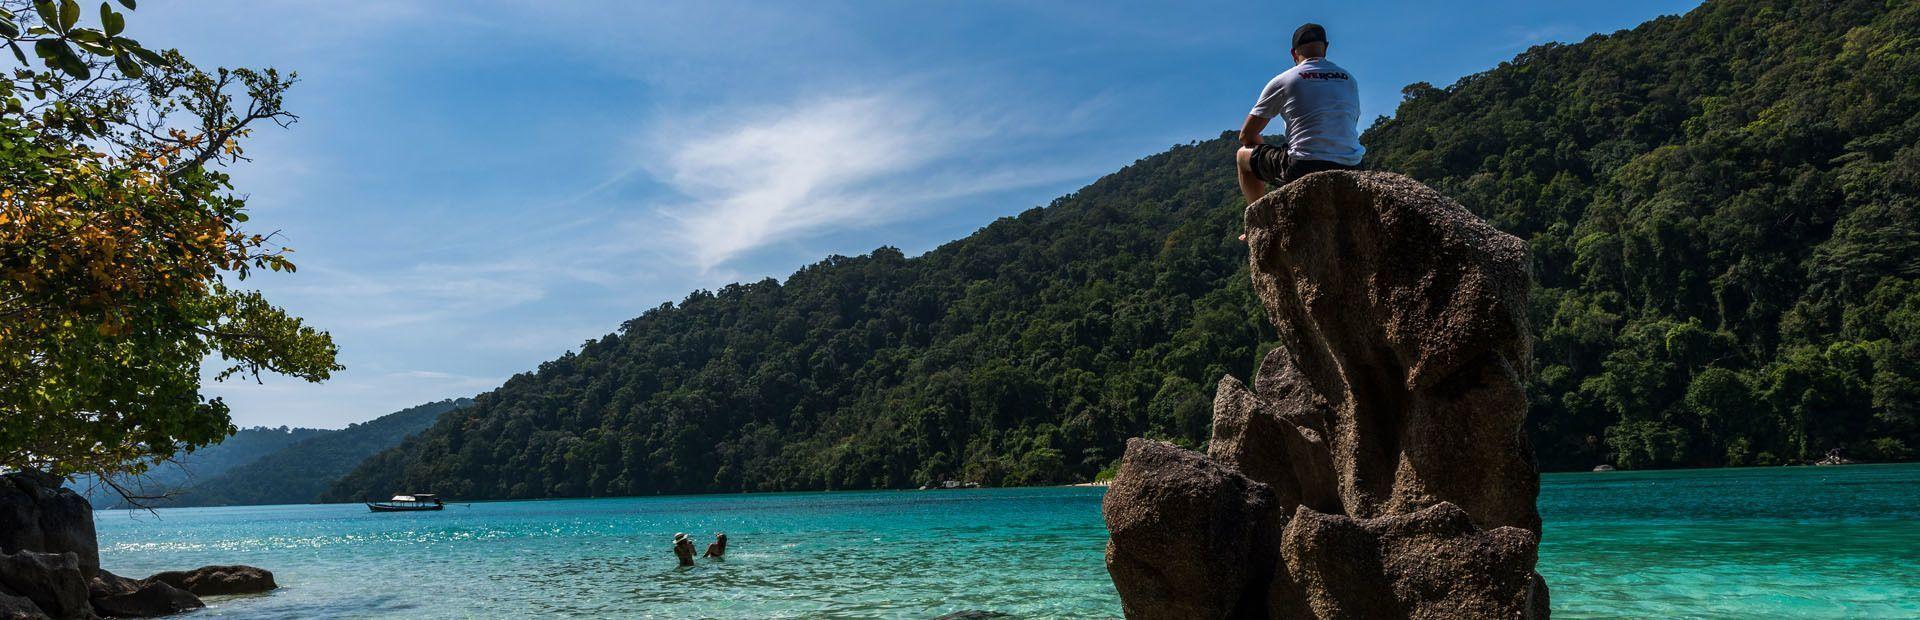 Thailandia beach life and summer island discovery